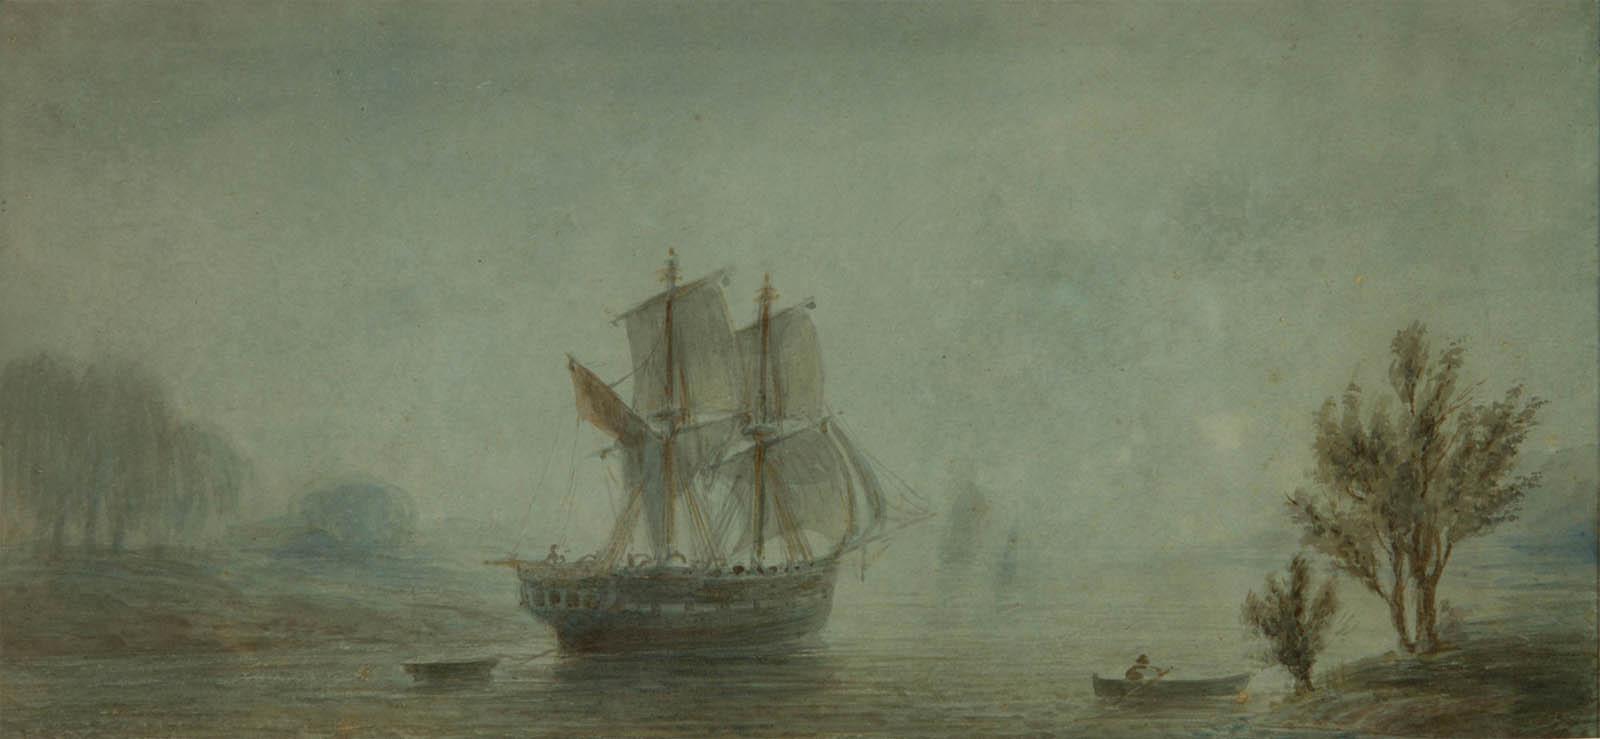 Paisaje de la costa con veleros